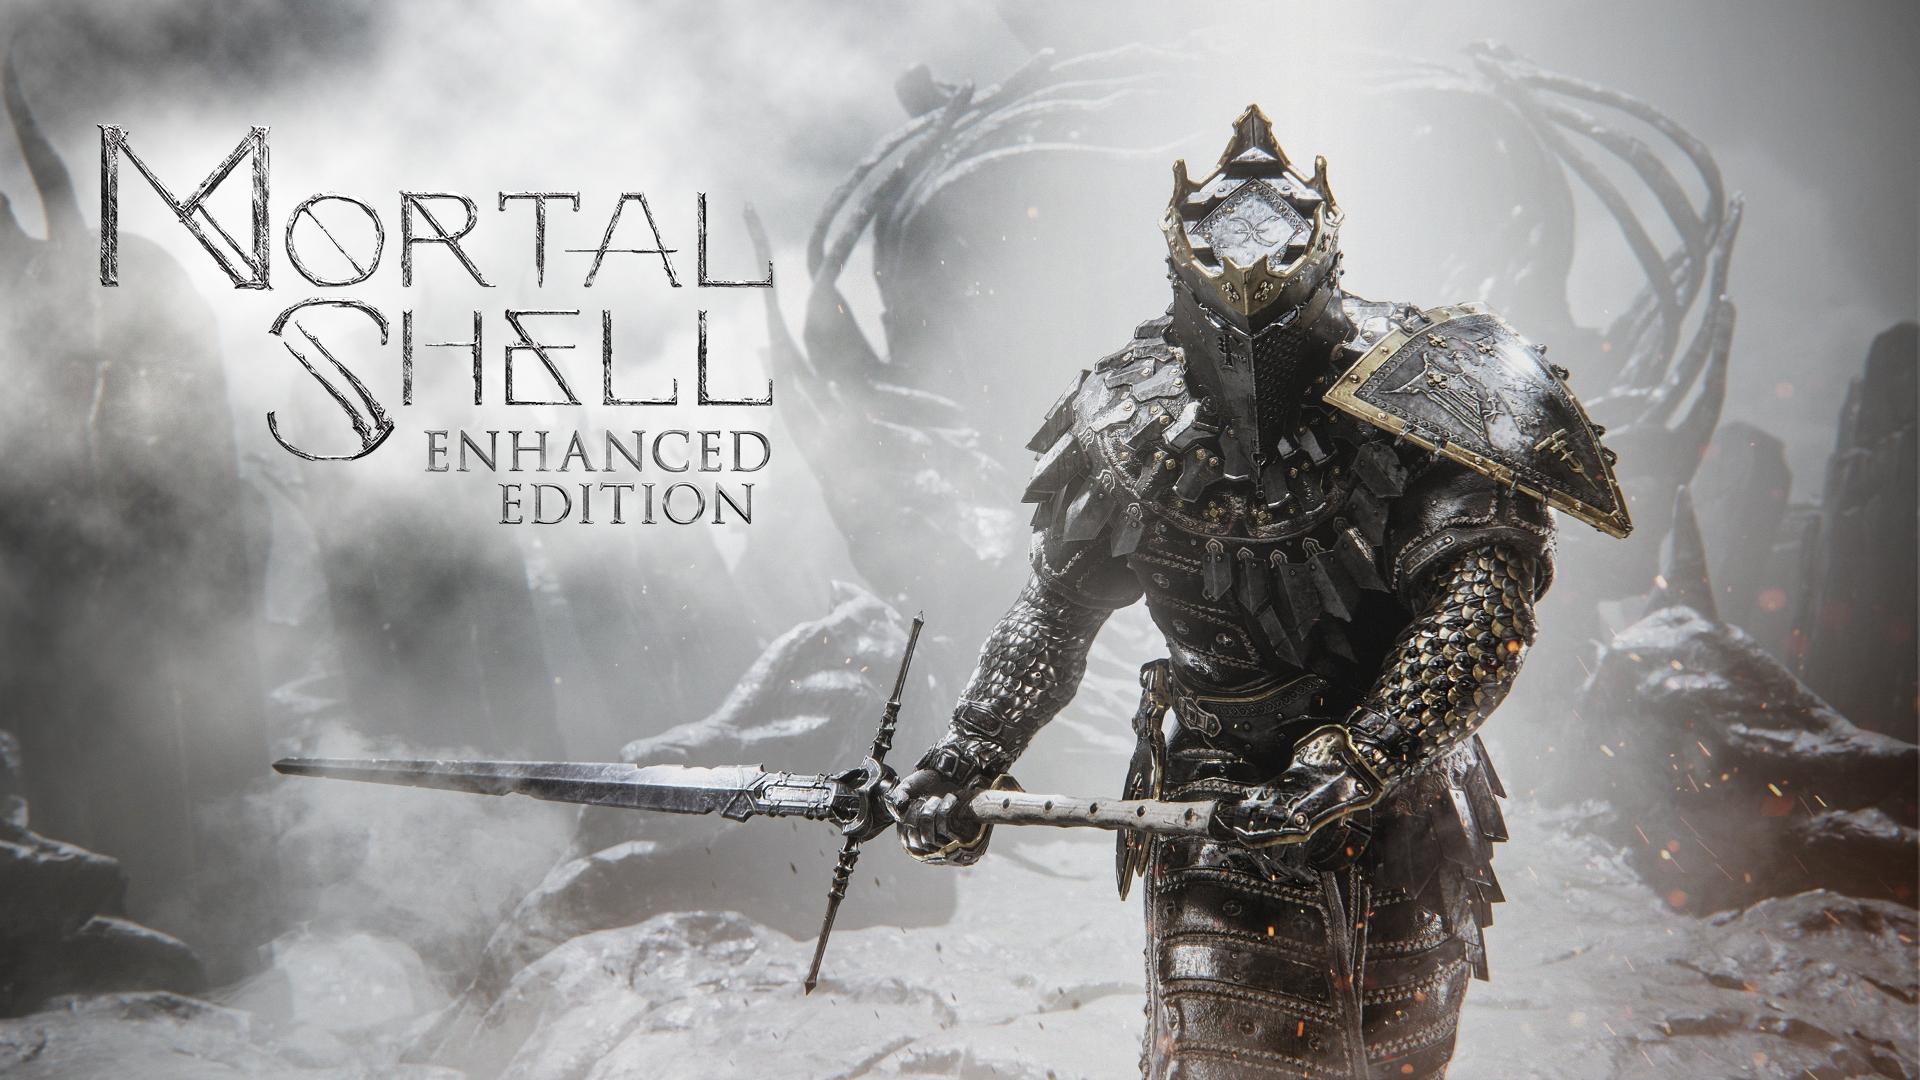 mortal shell enhanced edition hd wallpaper 74285